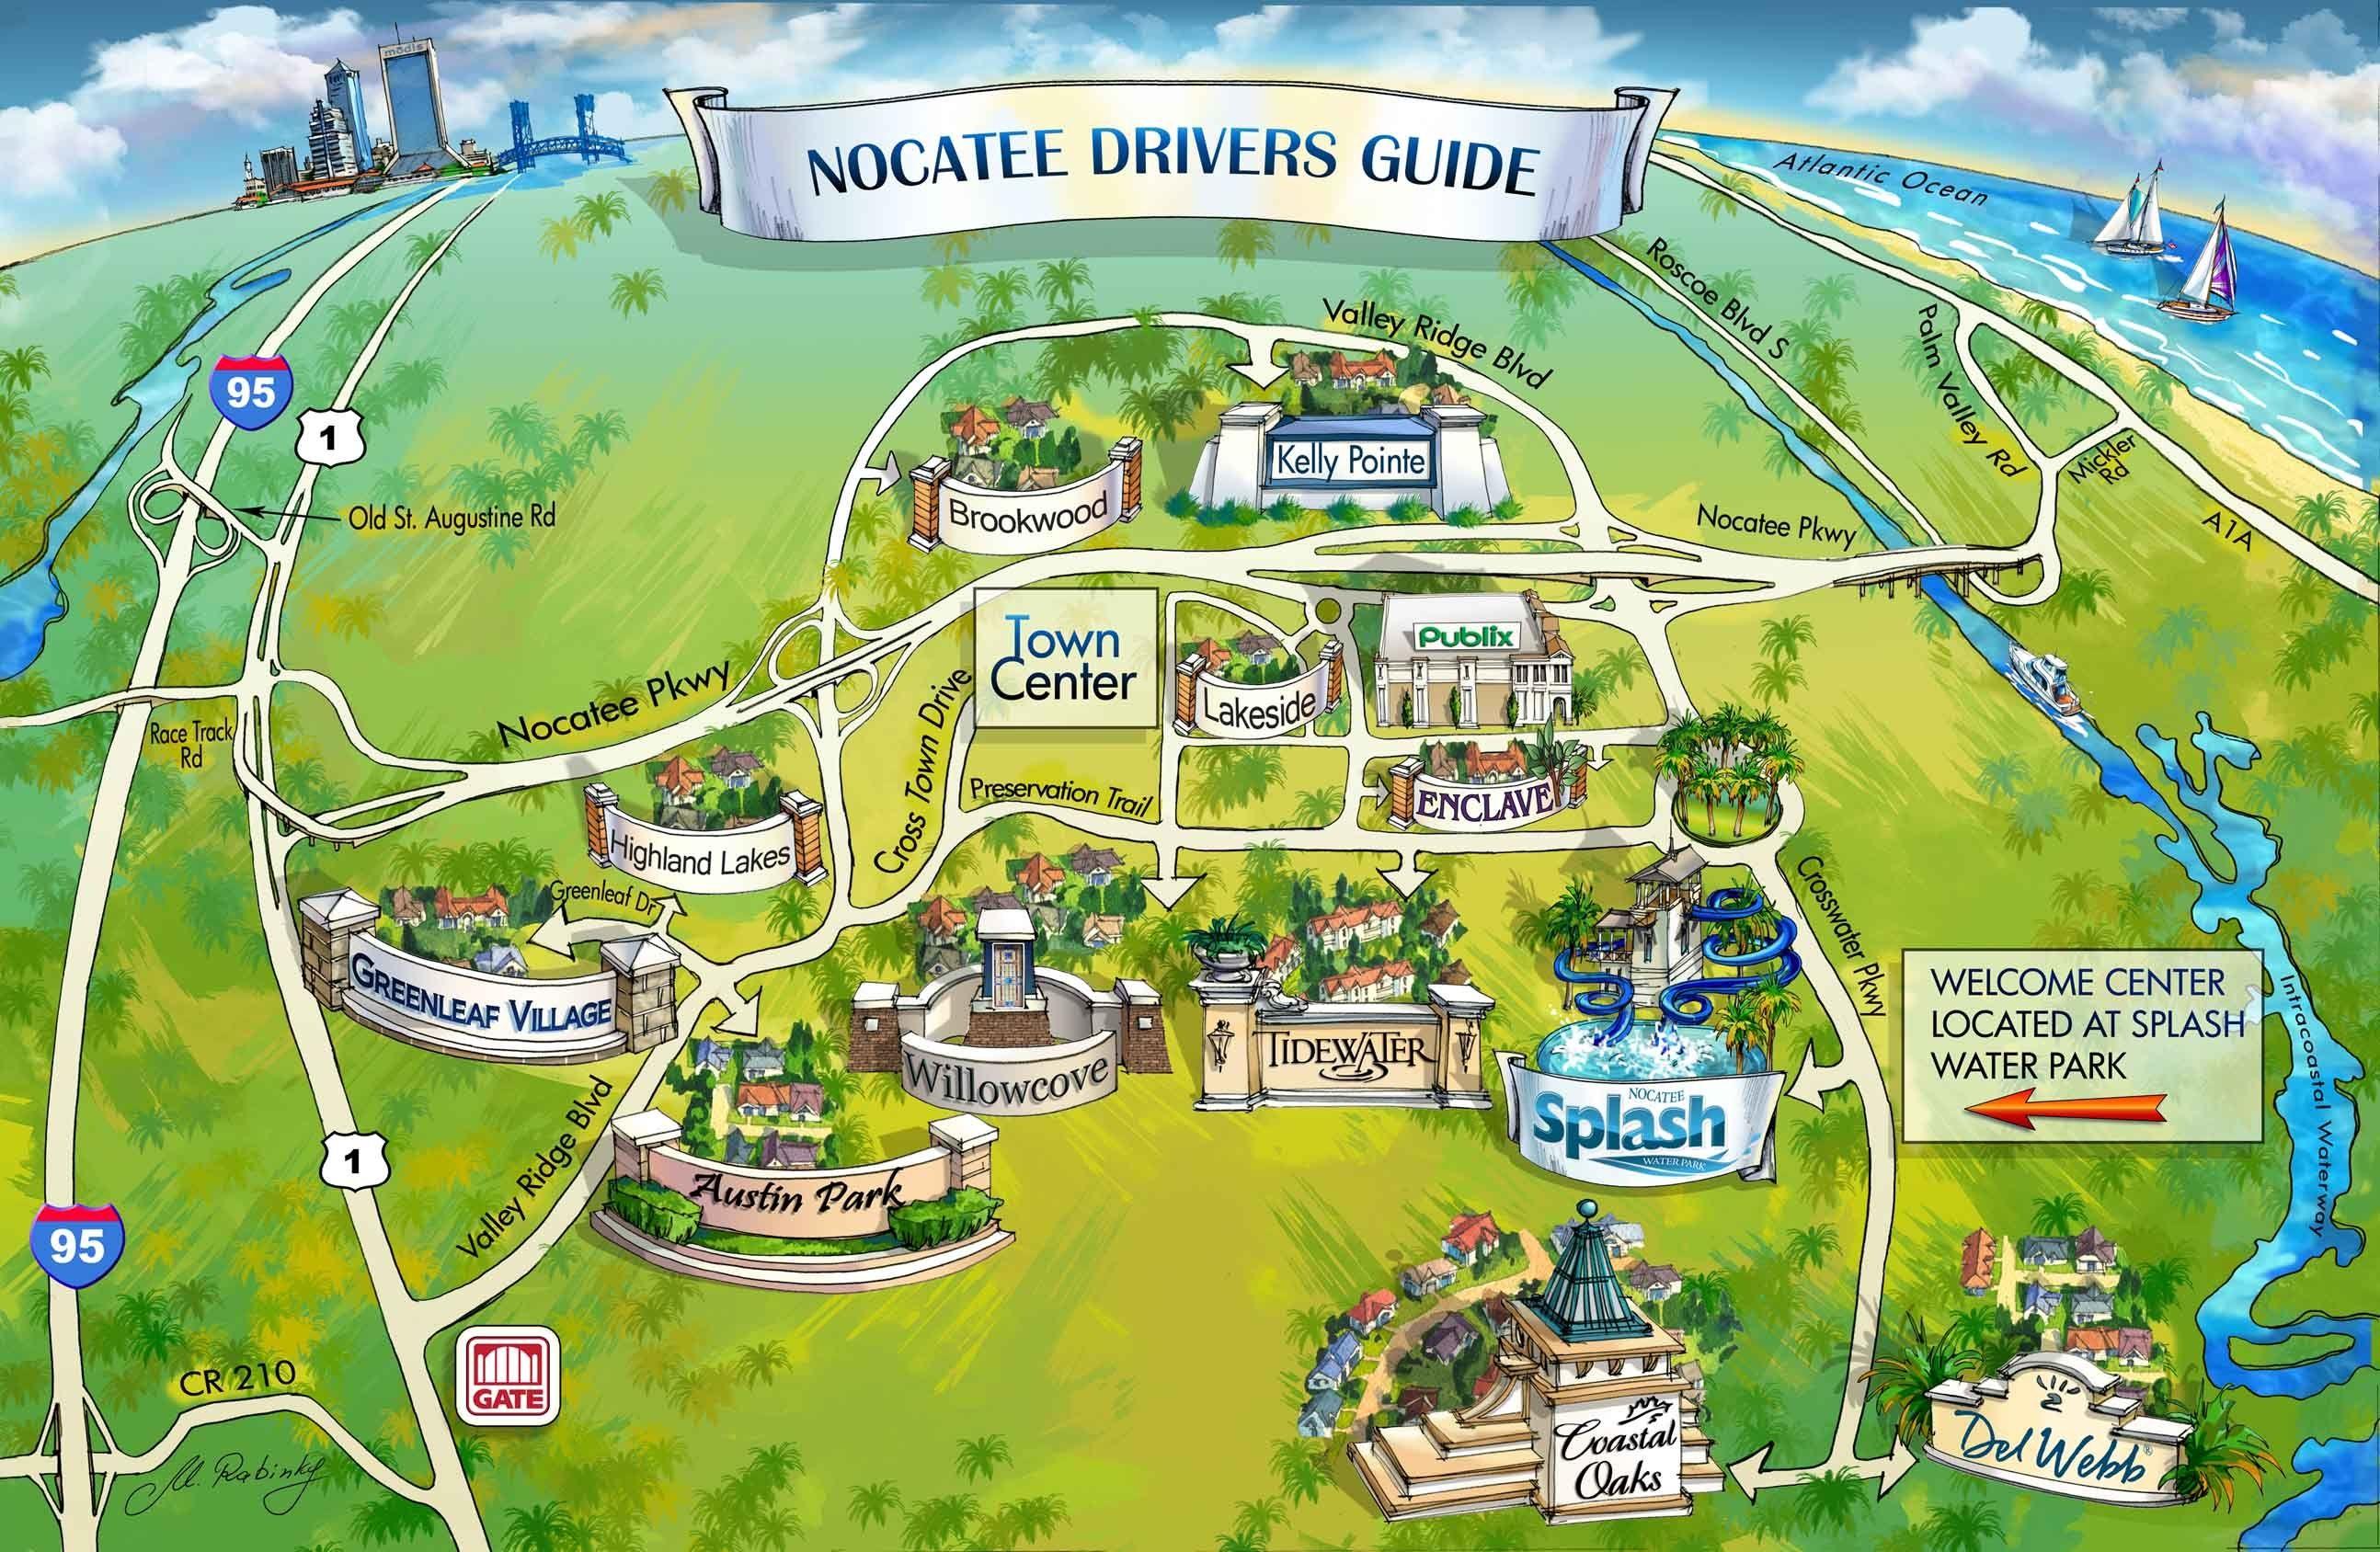 Nocatee Map Nocatee Moving To Florida Florida Home Dream Home